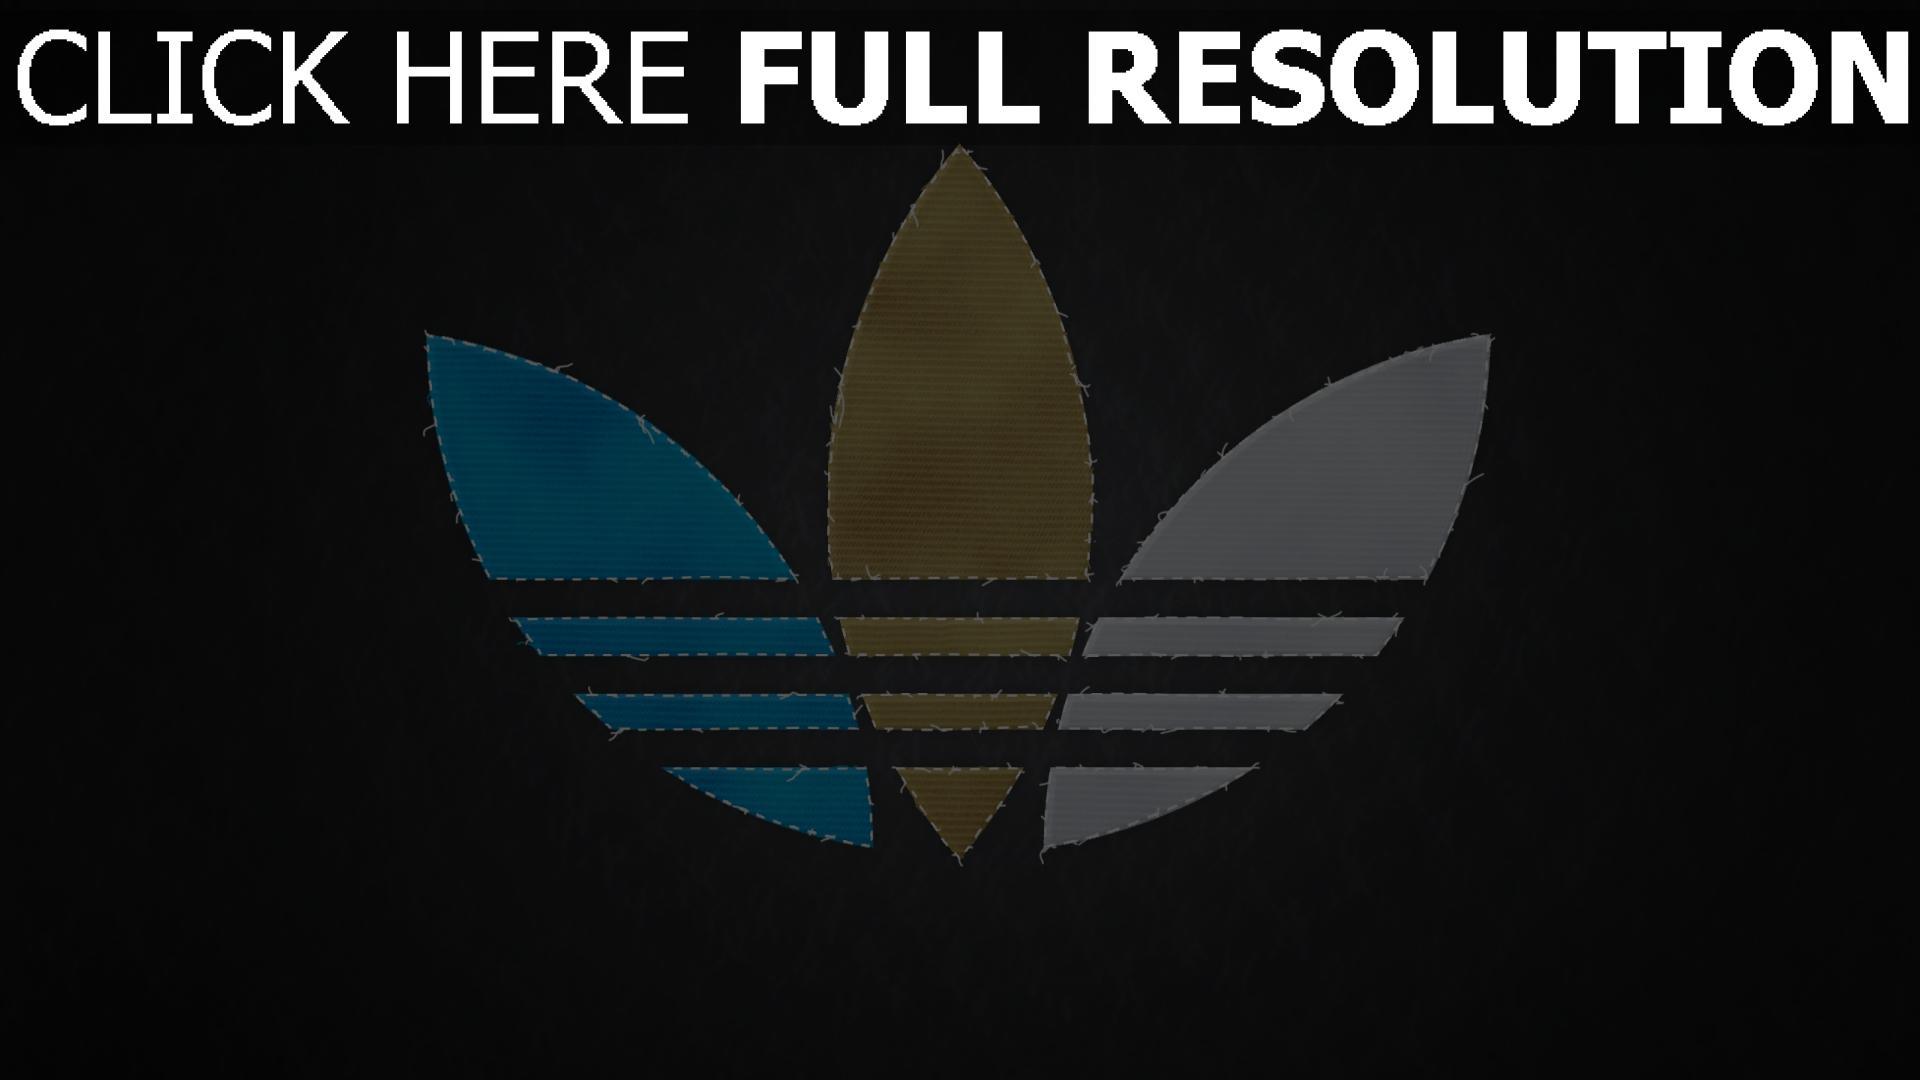 Adidas Original Wallpaper Black Hd Soldes Adidas Original Wallpaper